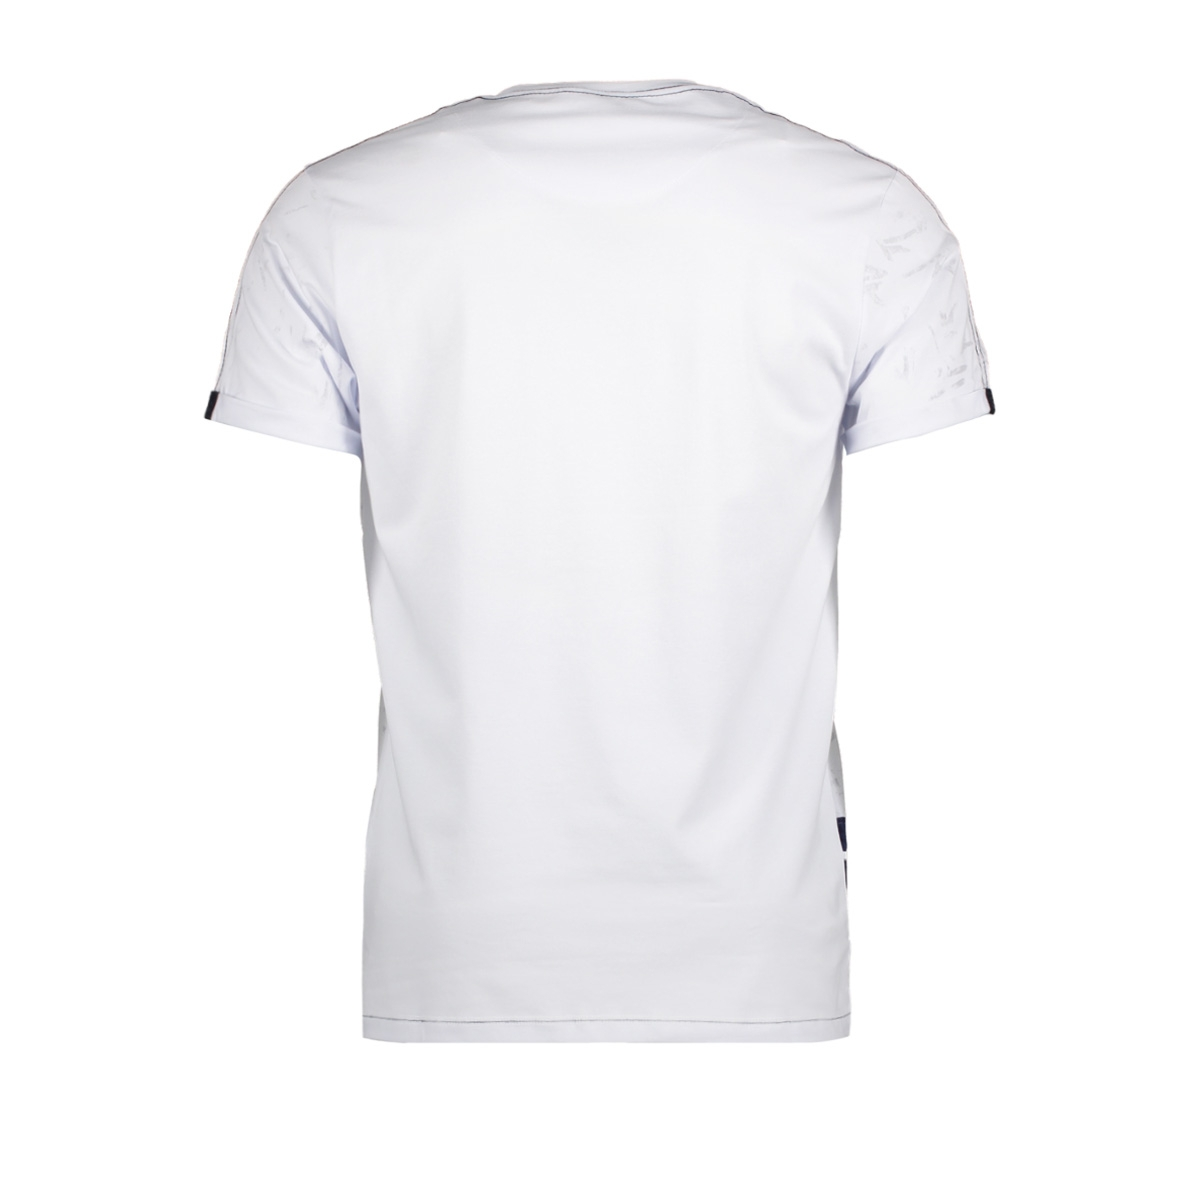 13885 gabbiano t-shirt white